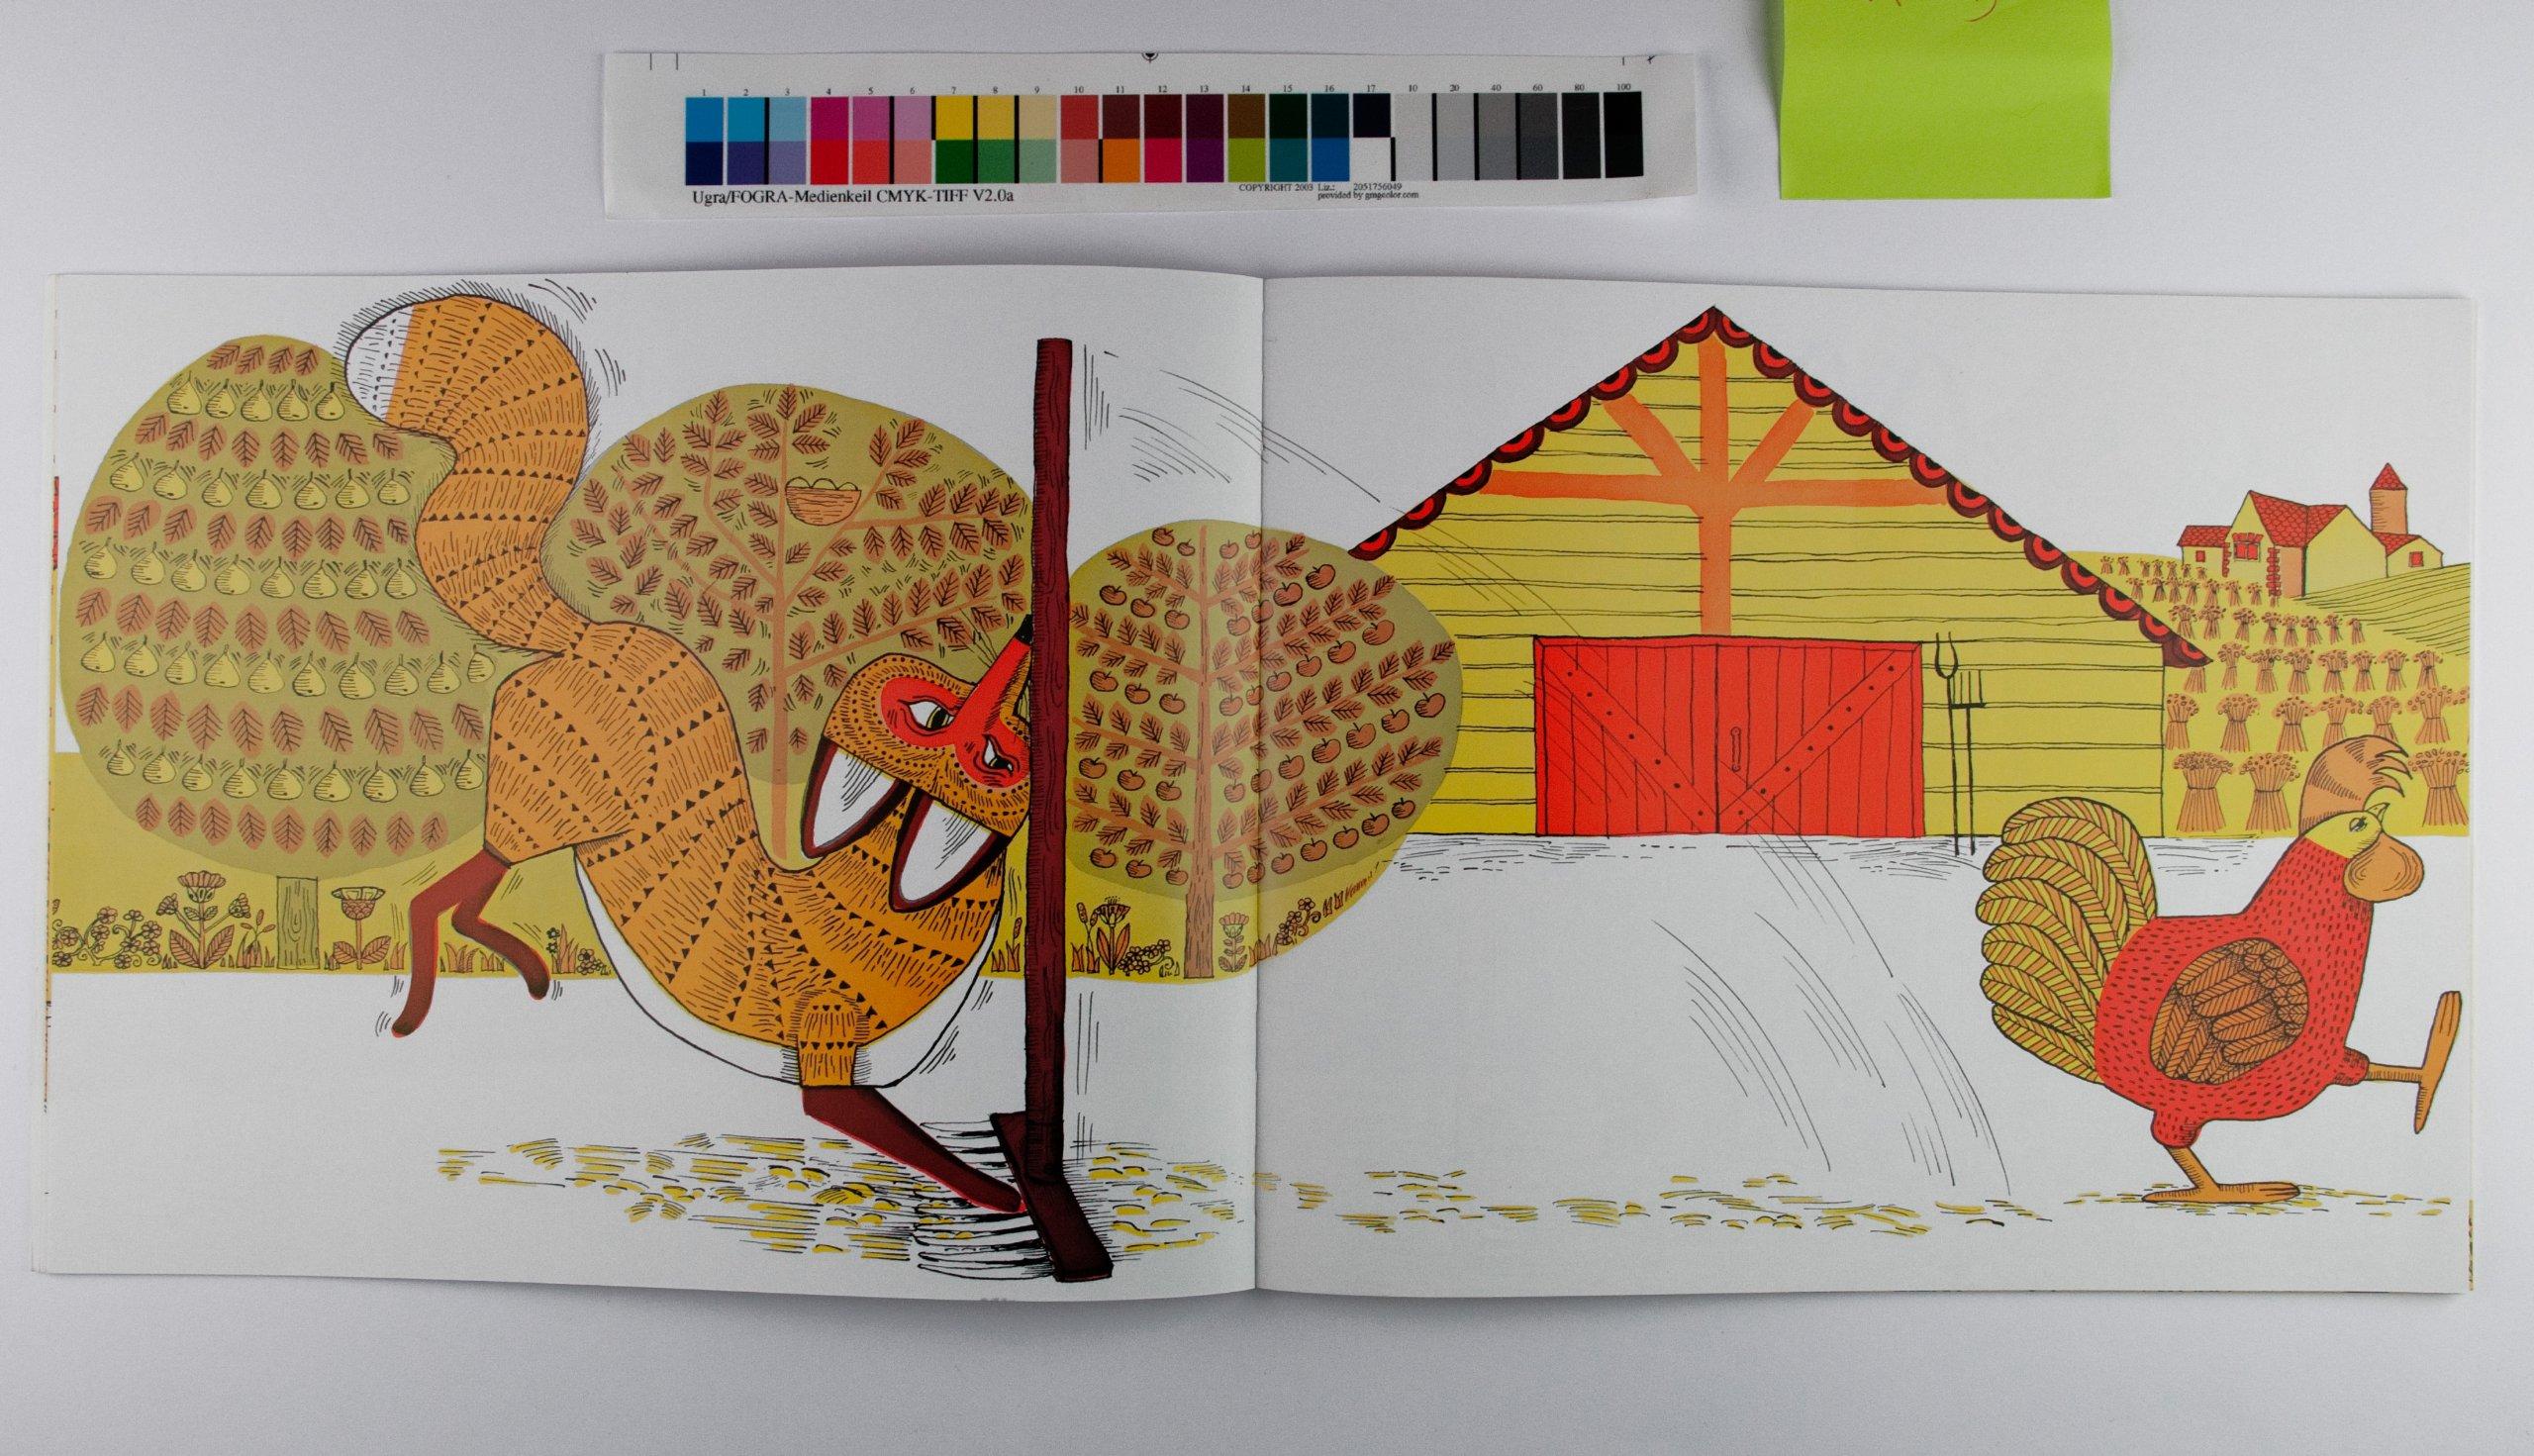 Childrenu0027s Picturebooks The Art of Visual Storytelling